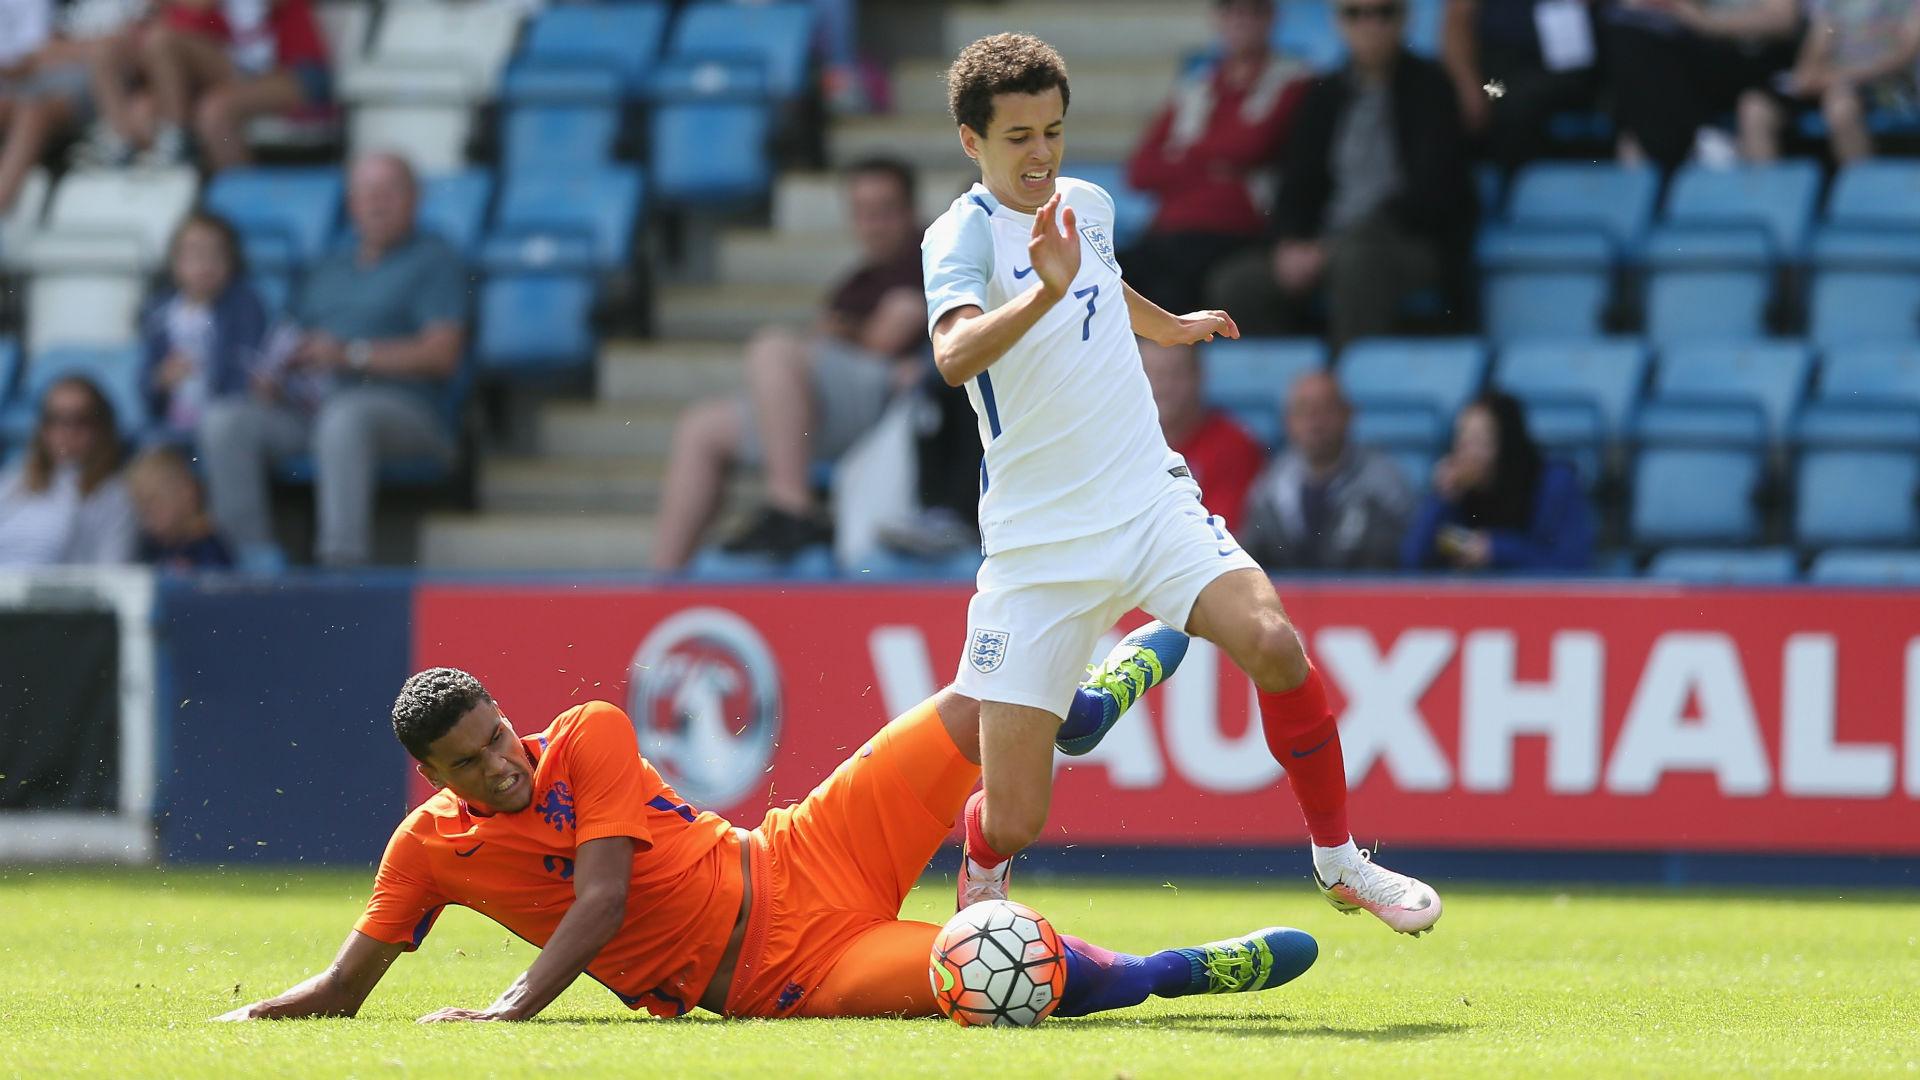 England Netherlands Under-19